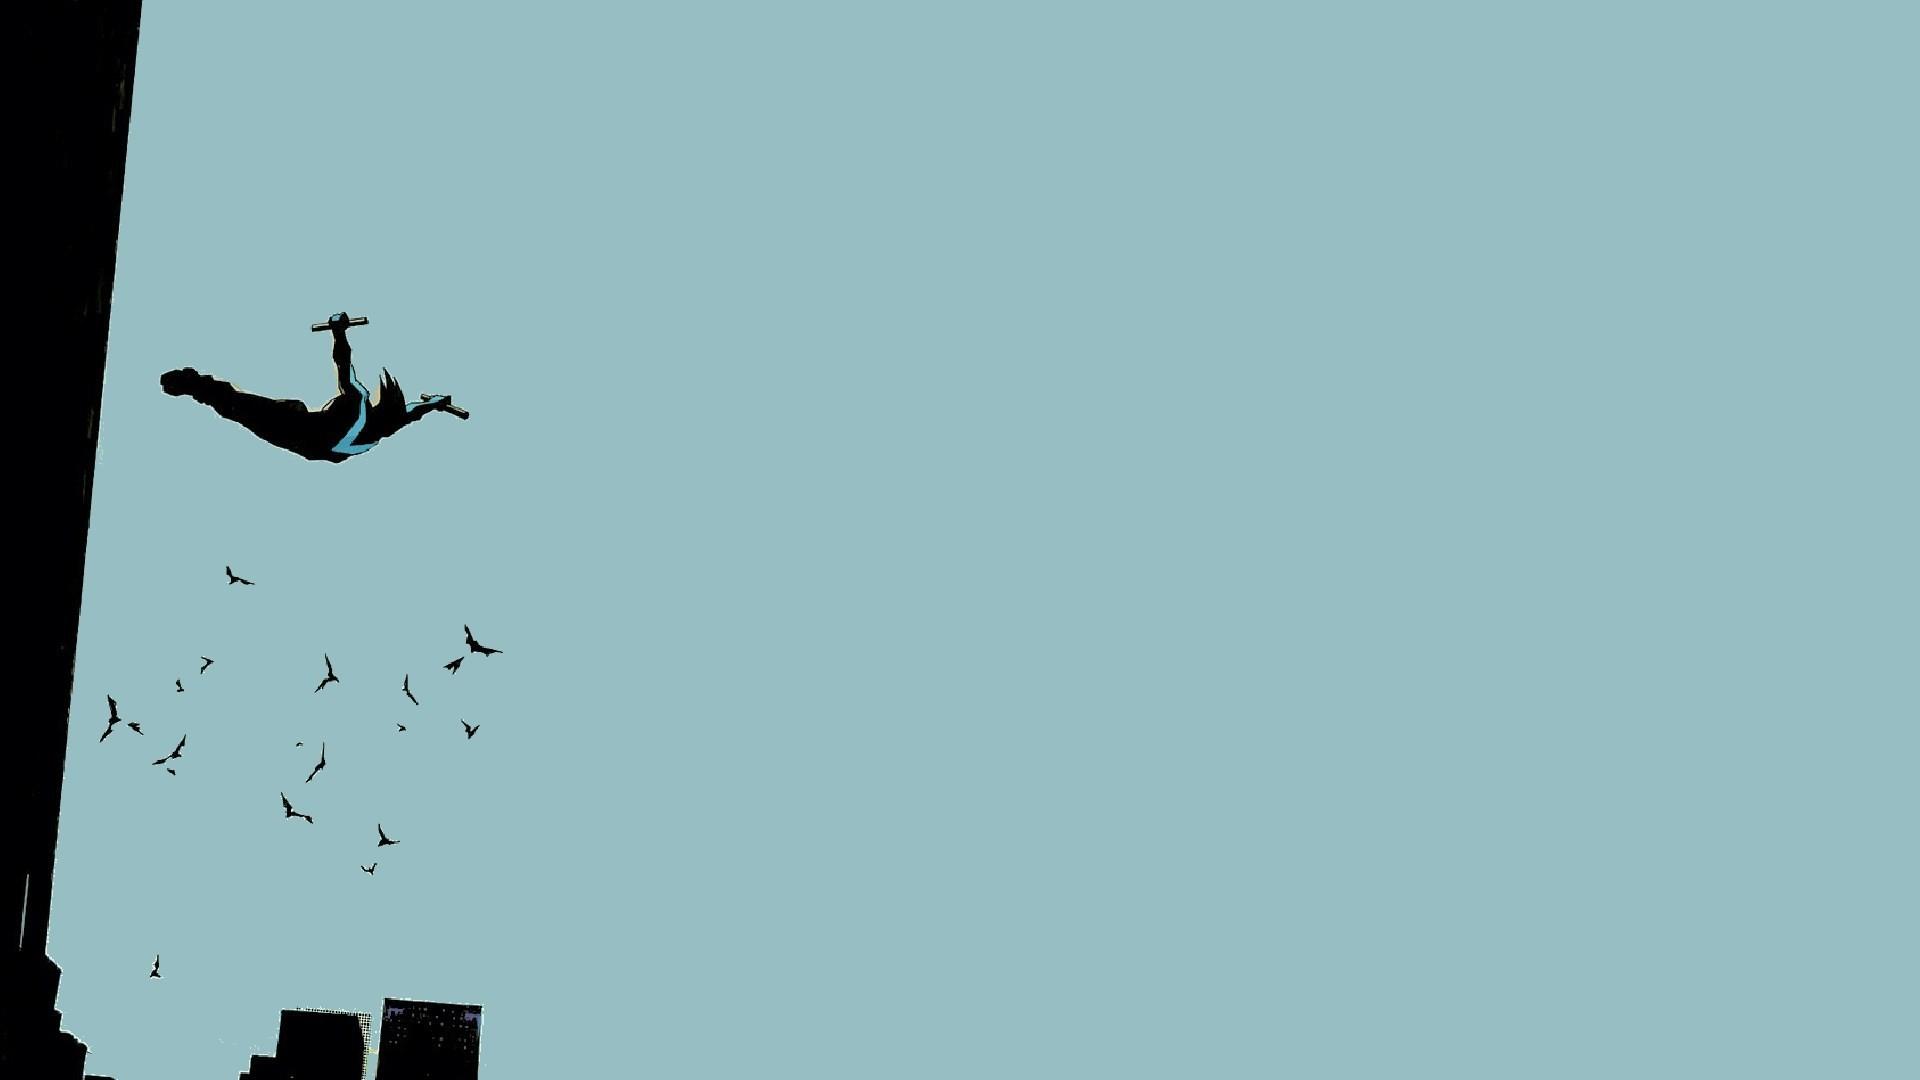 nightwing – Background hd 1920×1080